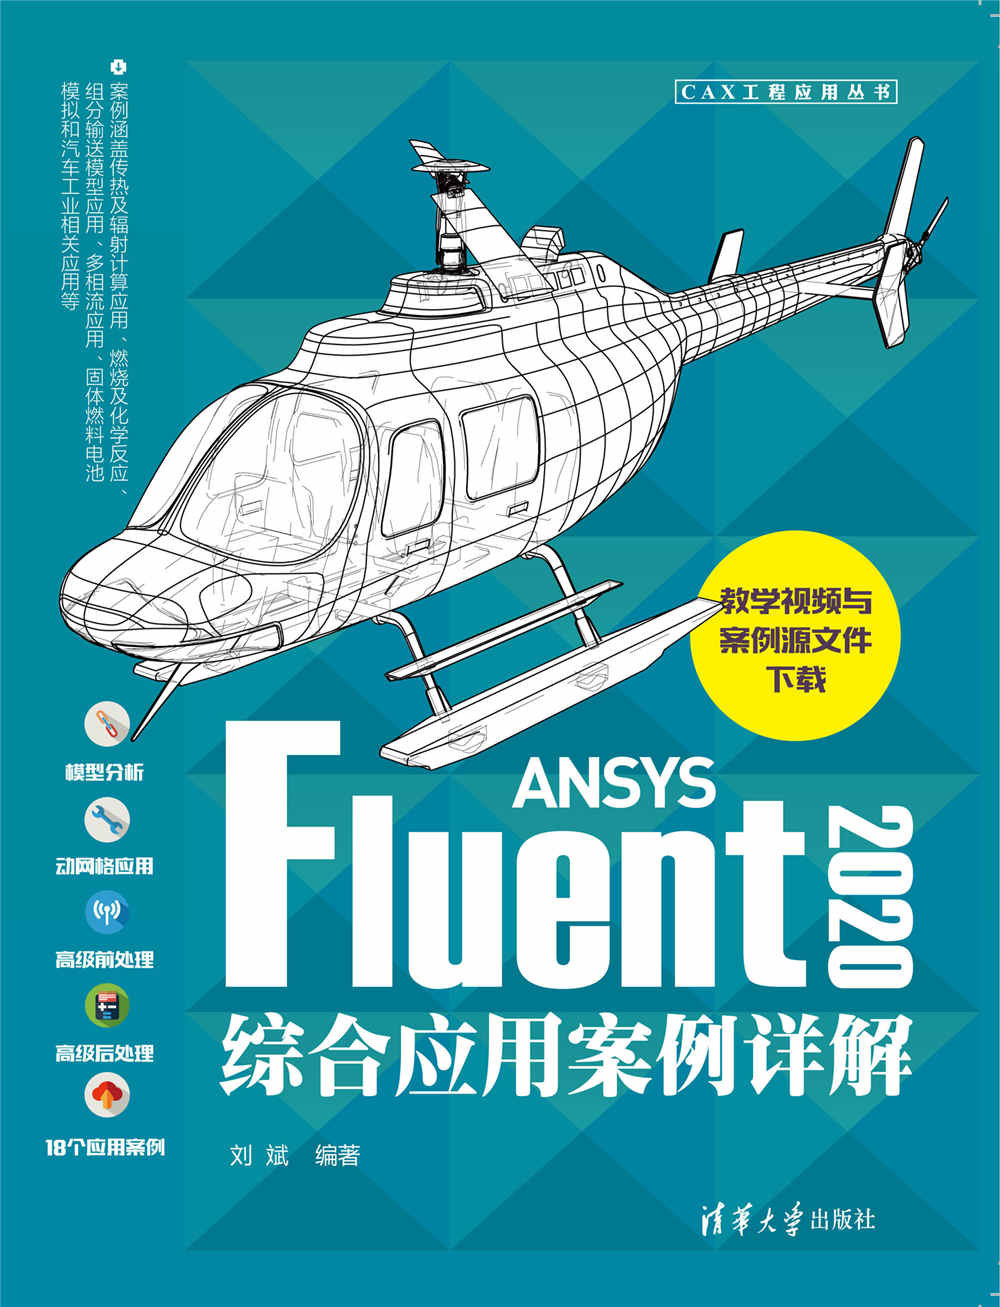 ANSYS Fluent 2020 綜合應用案例詳解-preview-1